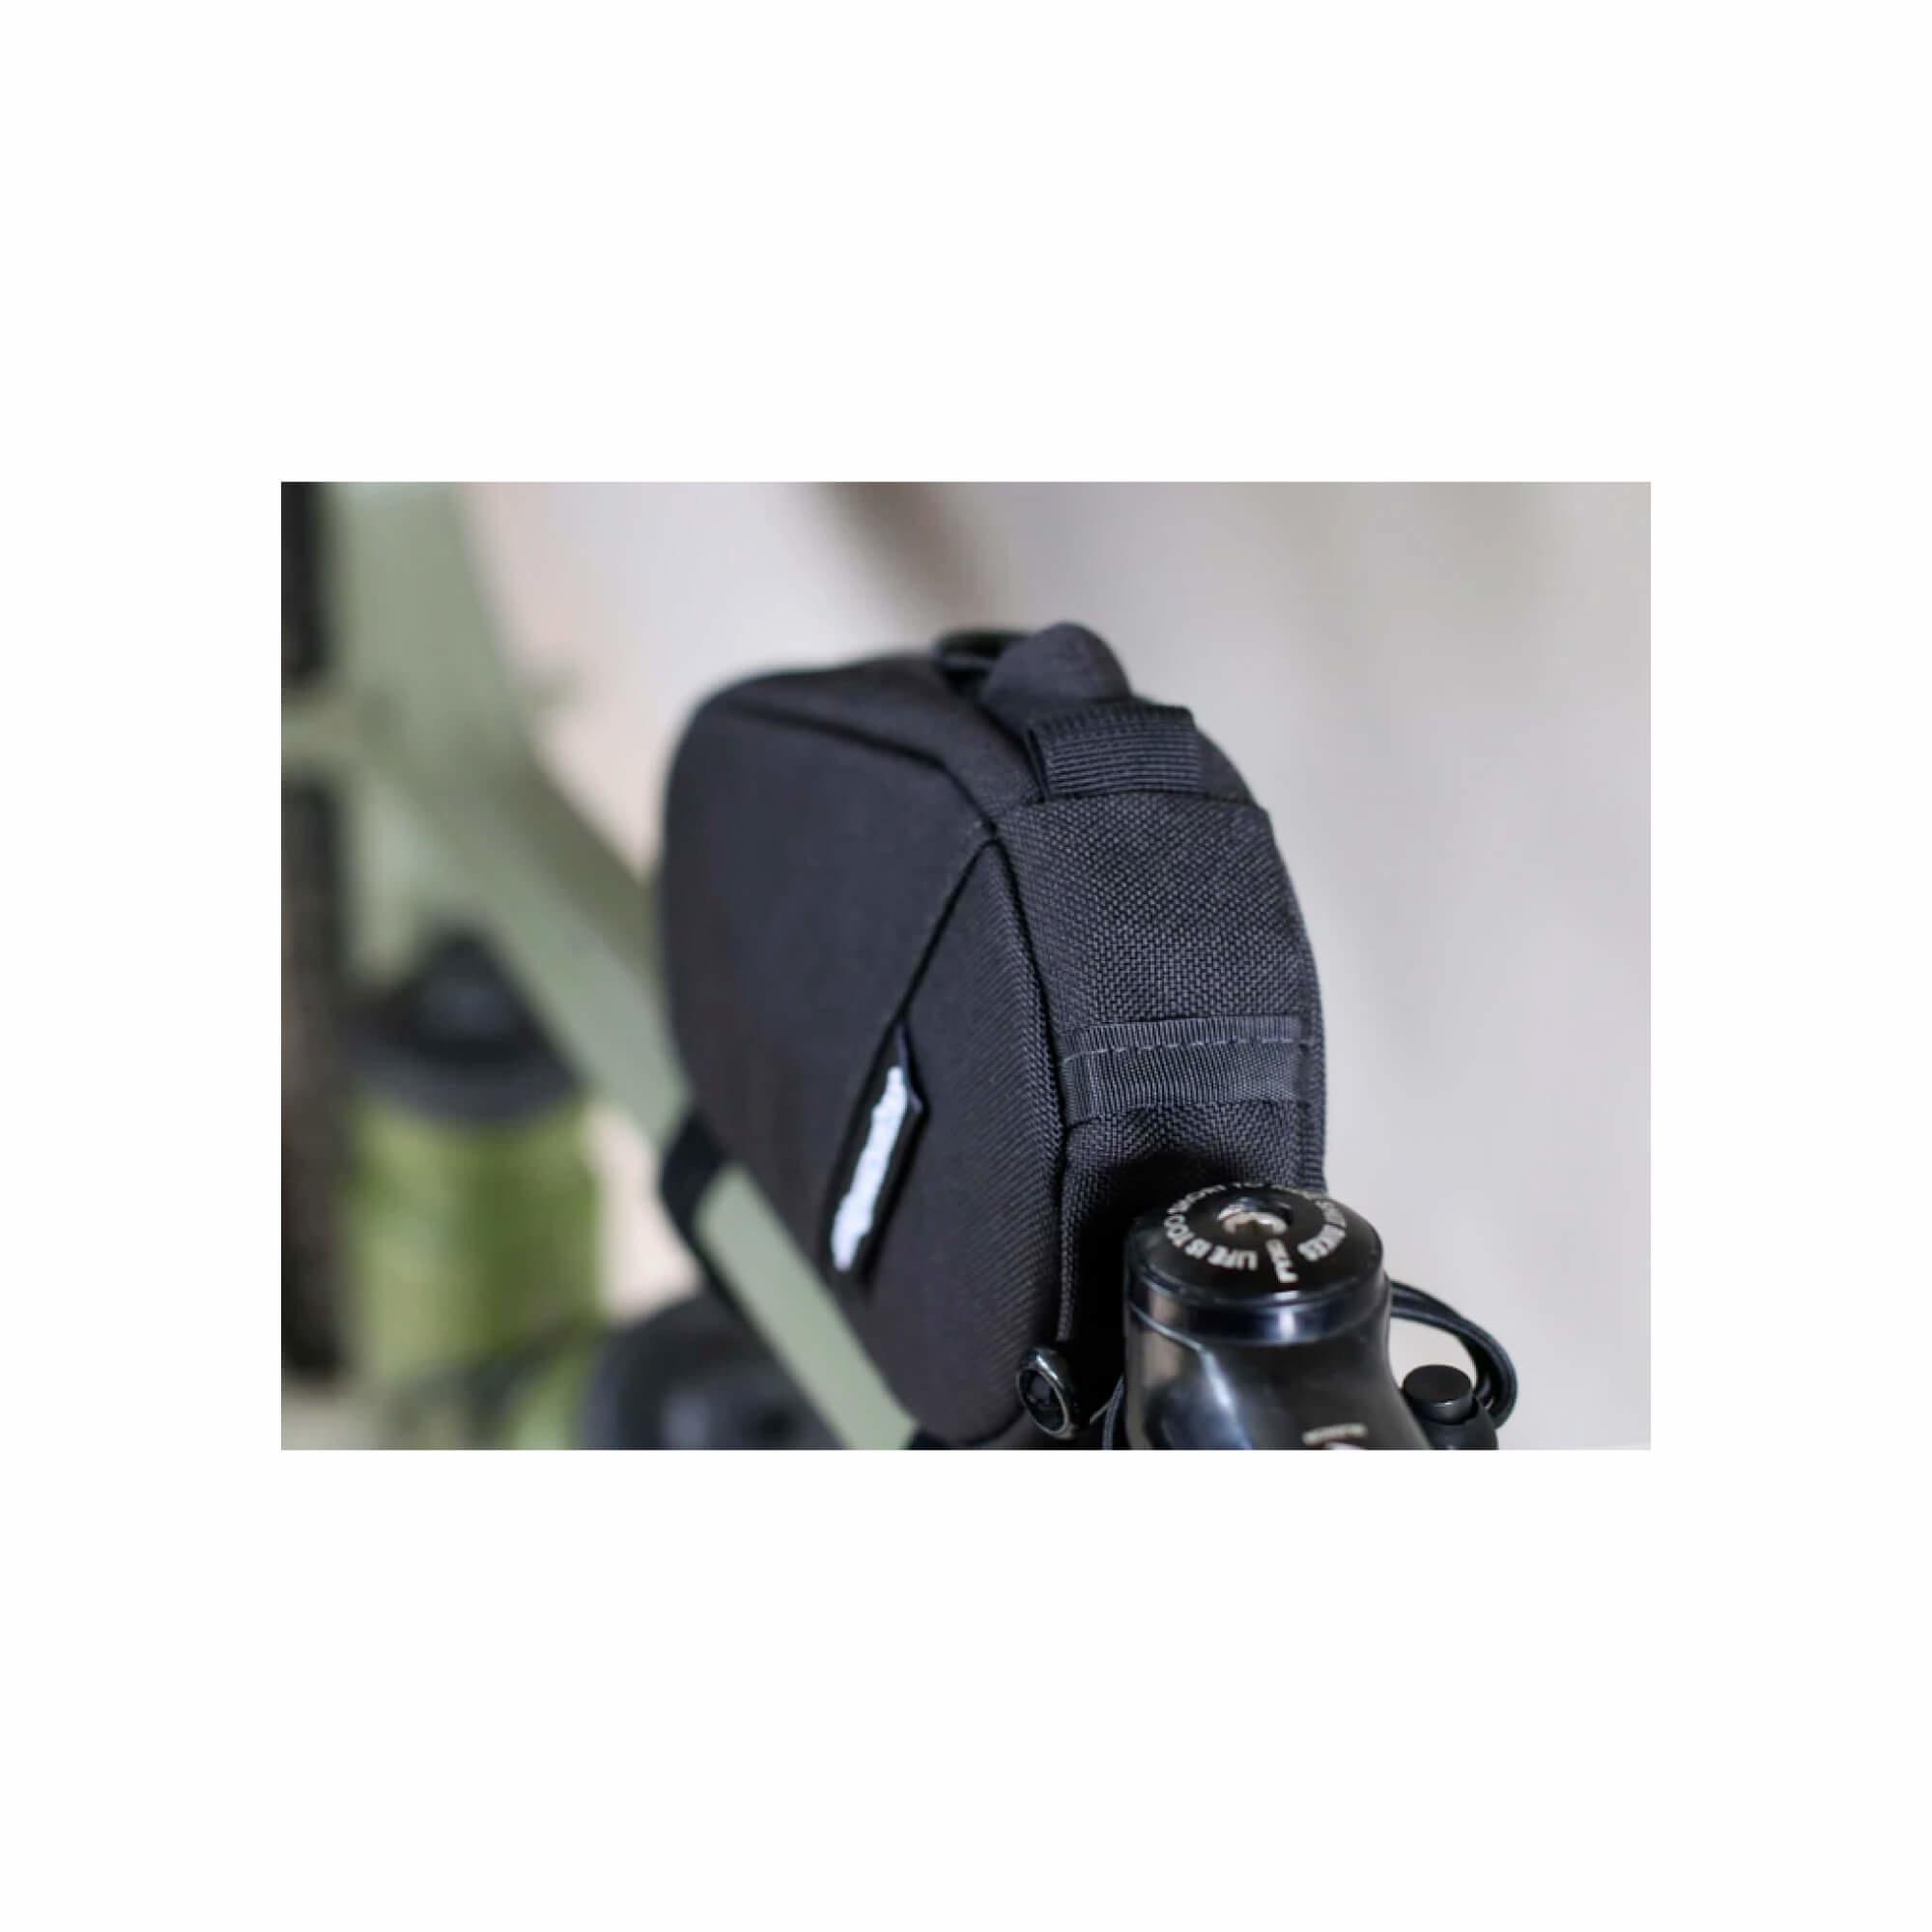 Amigo Top Tube Bag Black-12